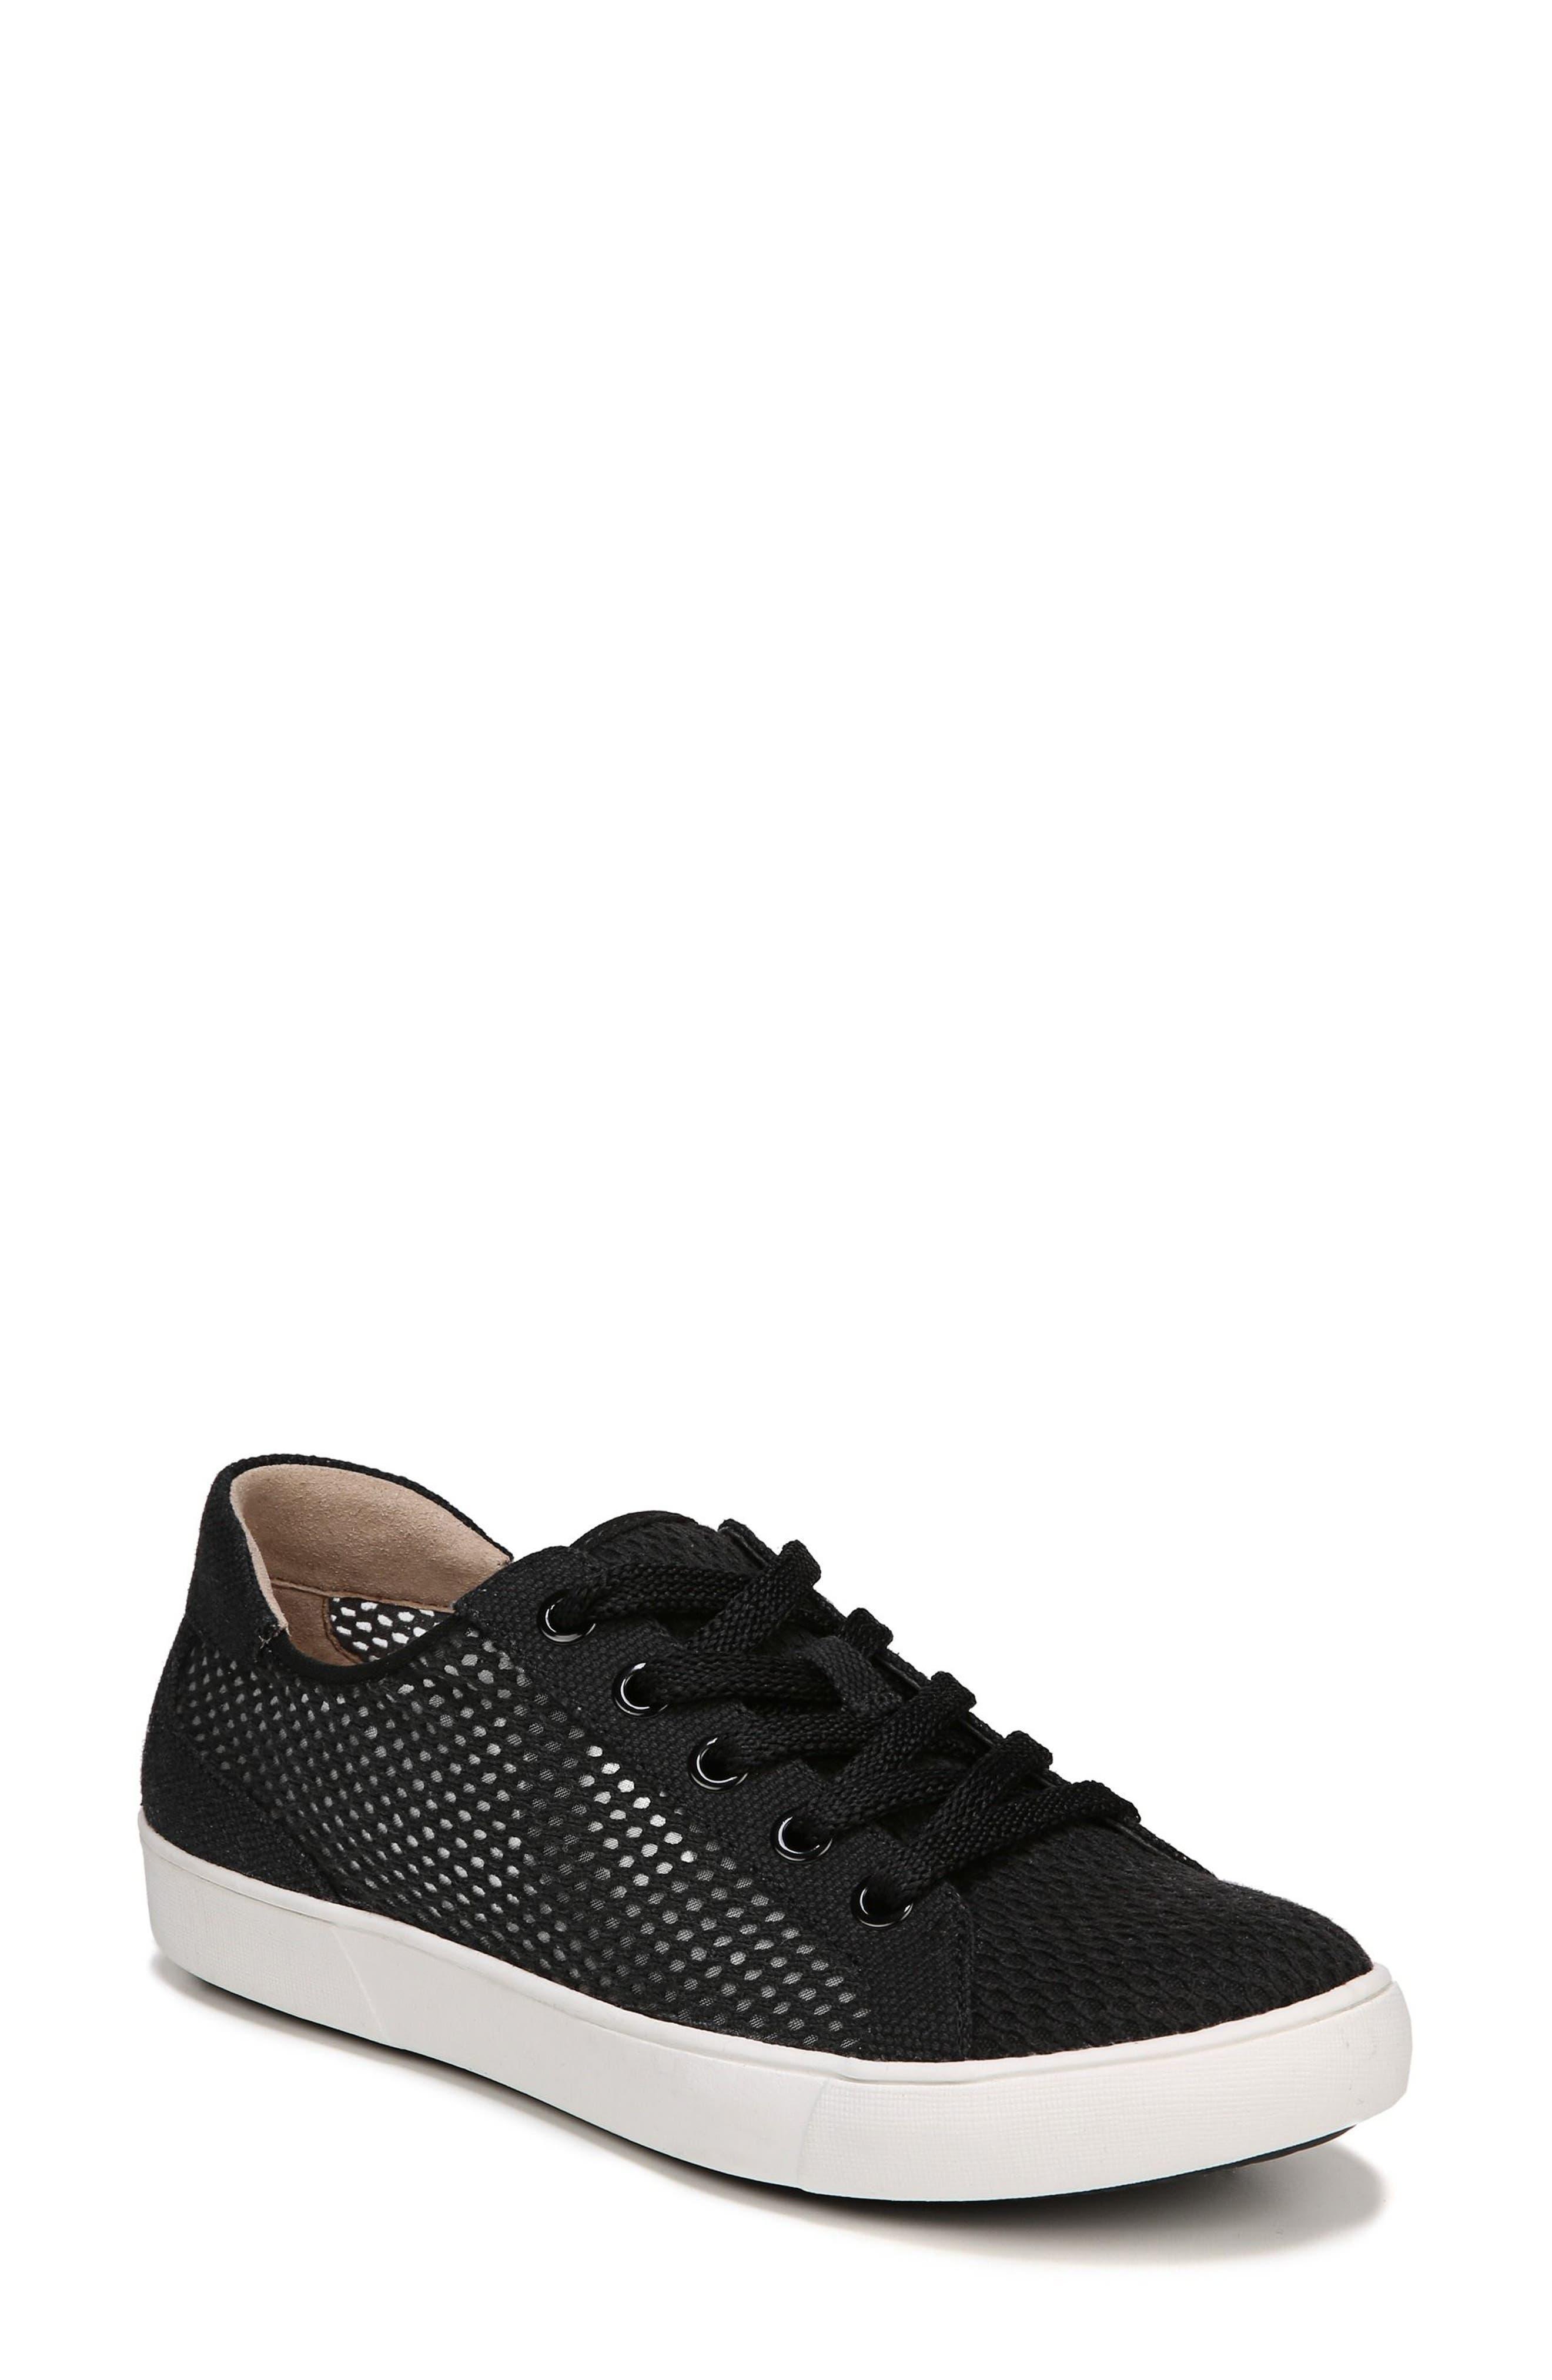 Morrison III Perforated Sneaker,                         Main,                         color, BLACK FABRIC